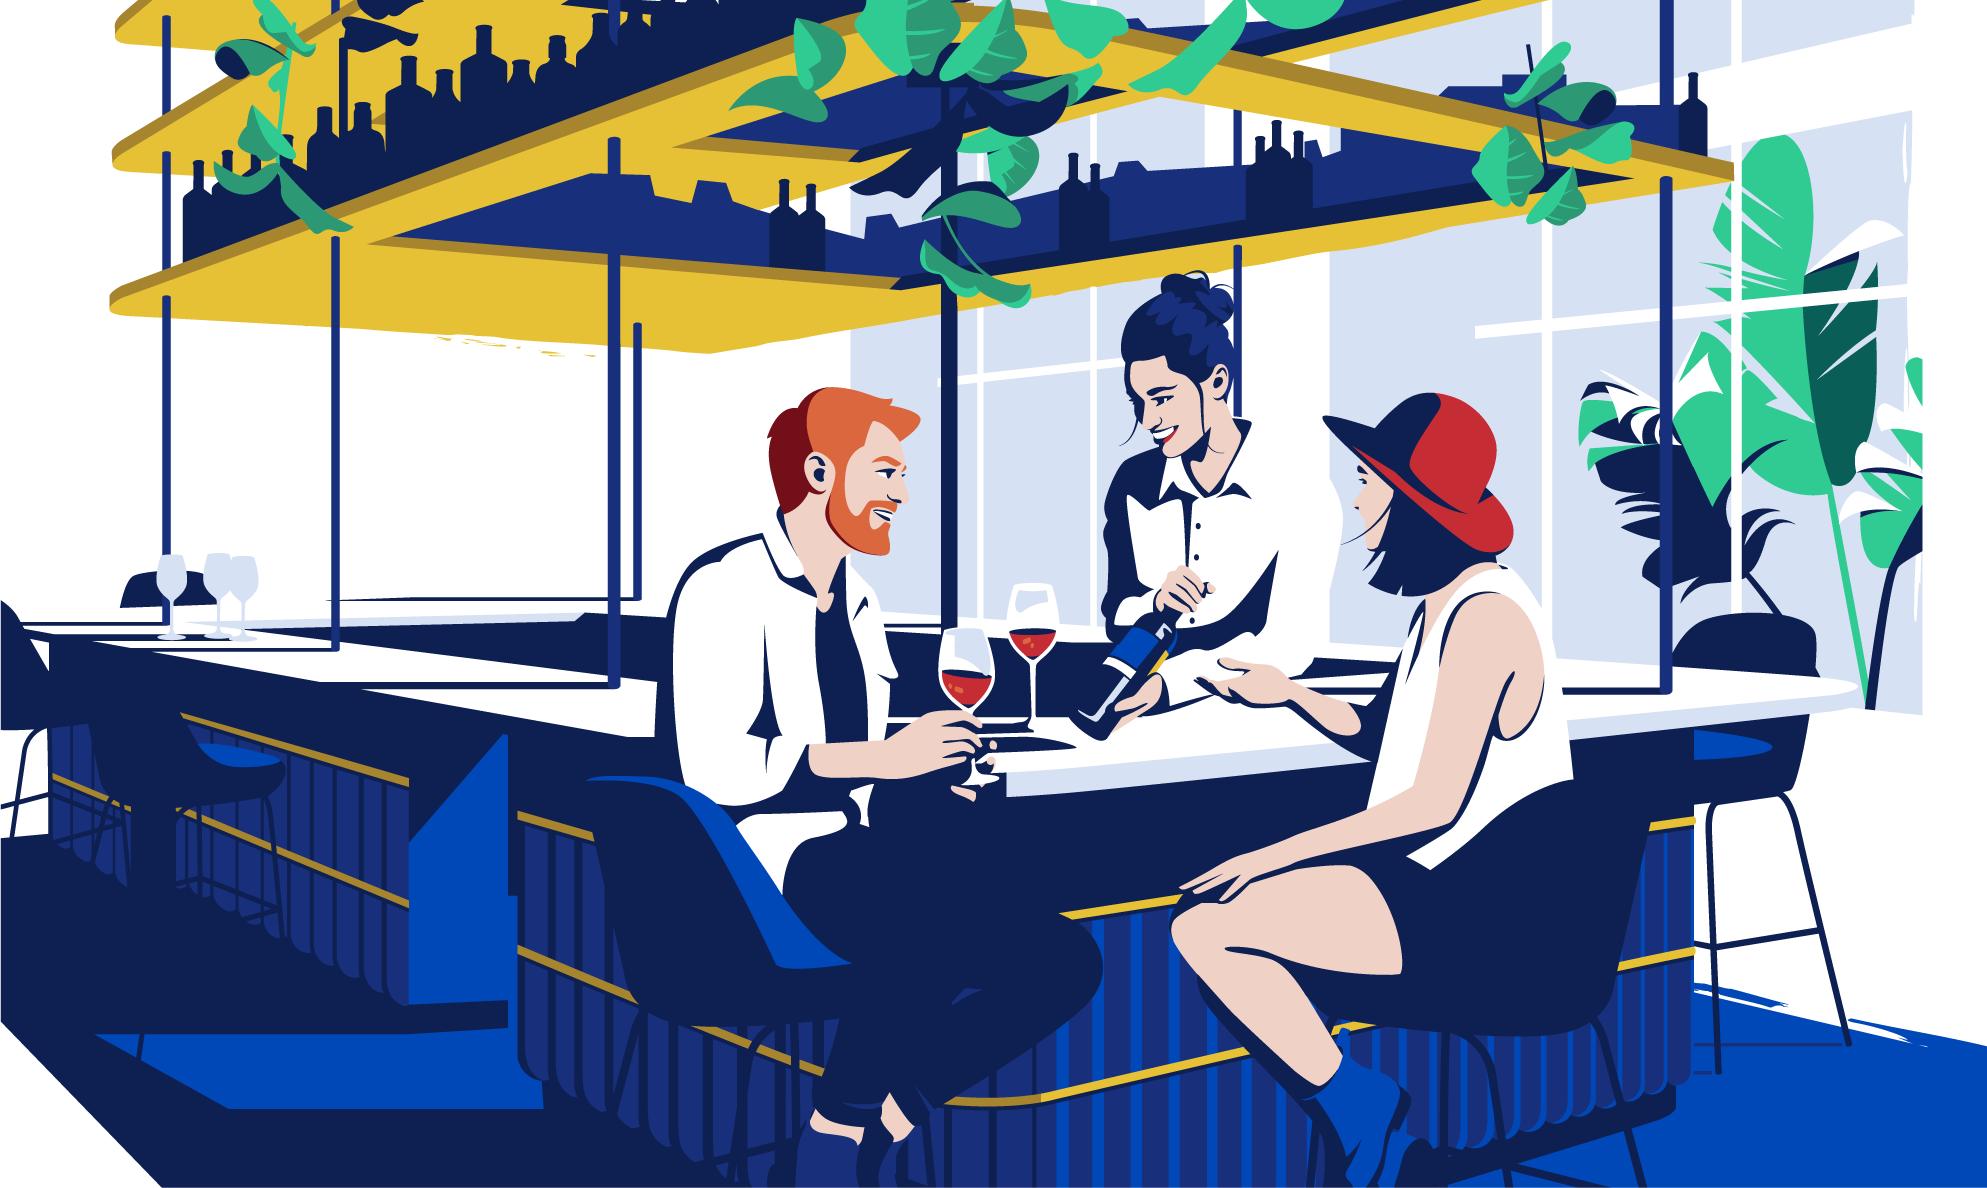 Illustration of Drinks&Co - El Chico Llama